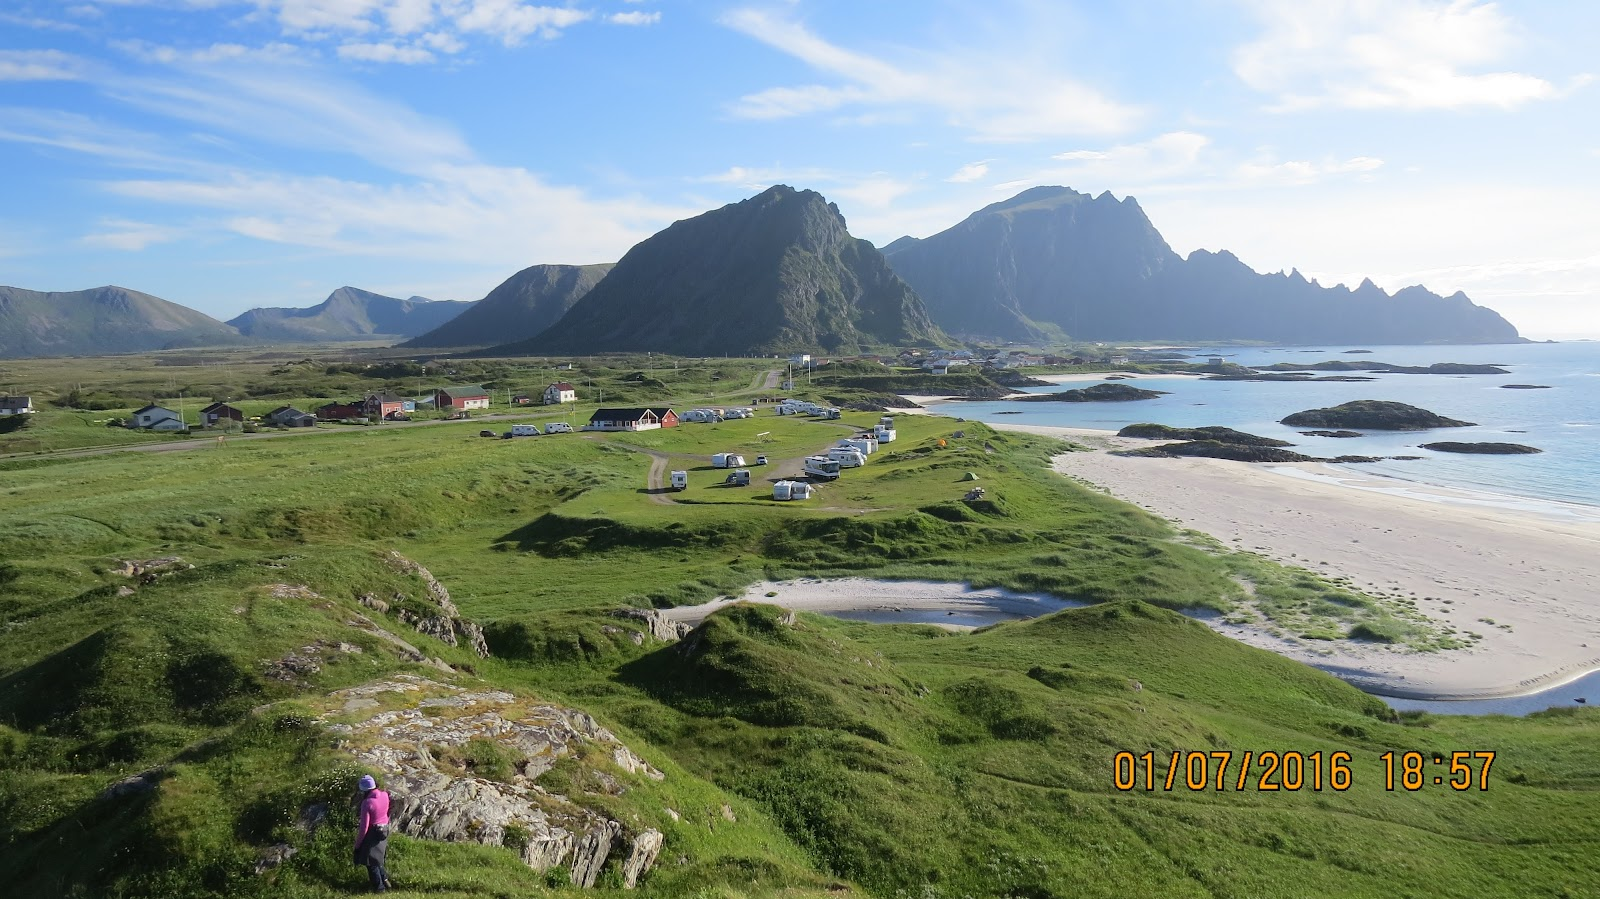 Sandnes camping andøy